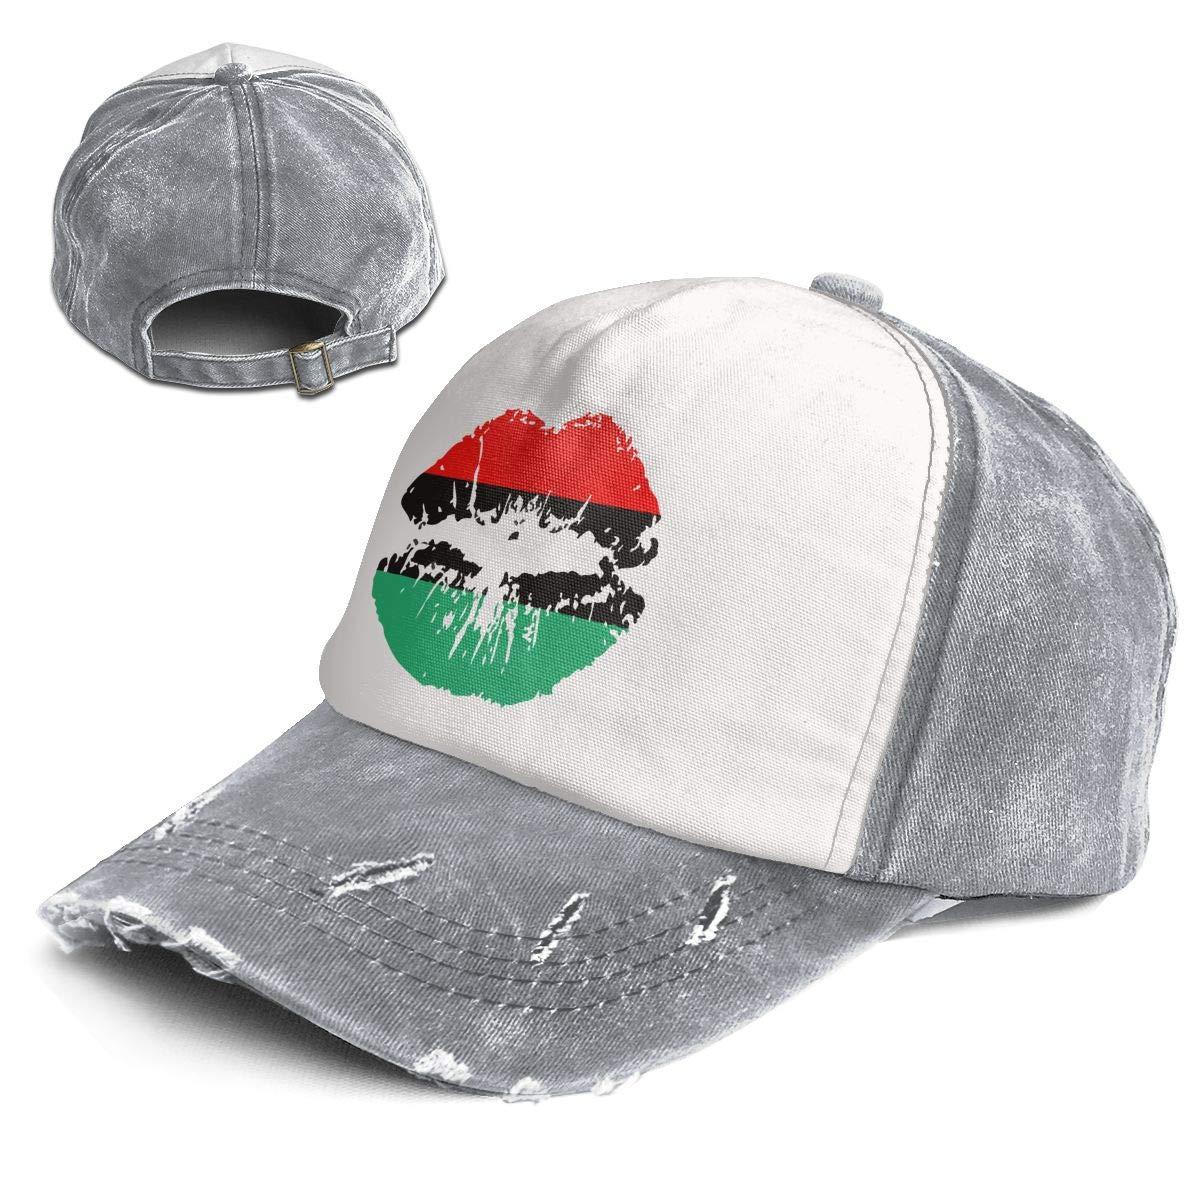 f4a0544ba38 Amazon.com  QZDLq Fashion Vintage Hat Pan American African Heritage Logo  Color Lips Adjustable Dad Hat Baseball Cowboy Cap  Clothing